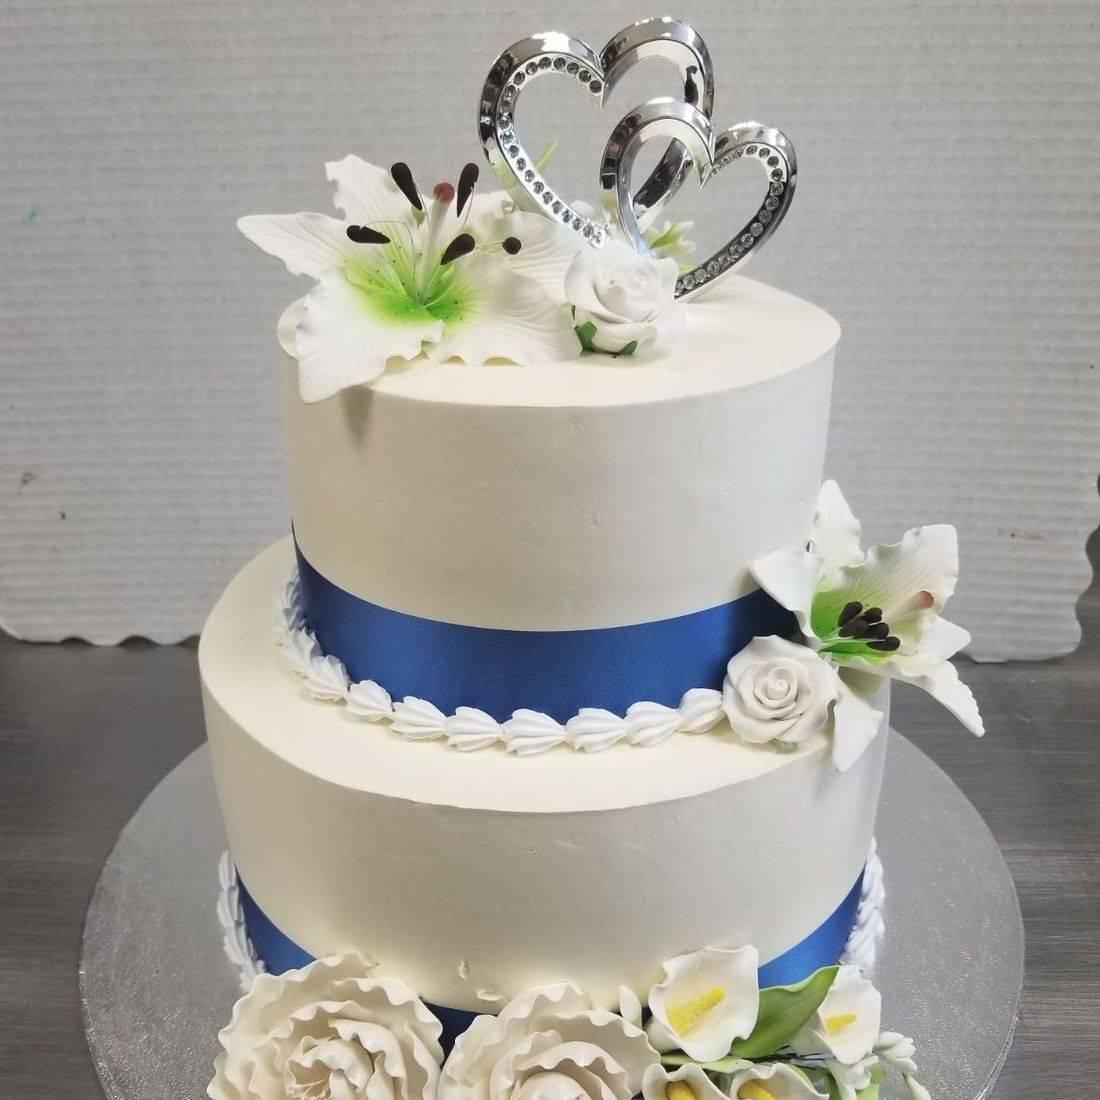 Wedding cake # 4